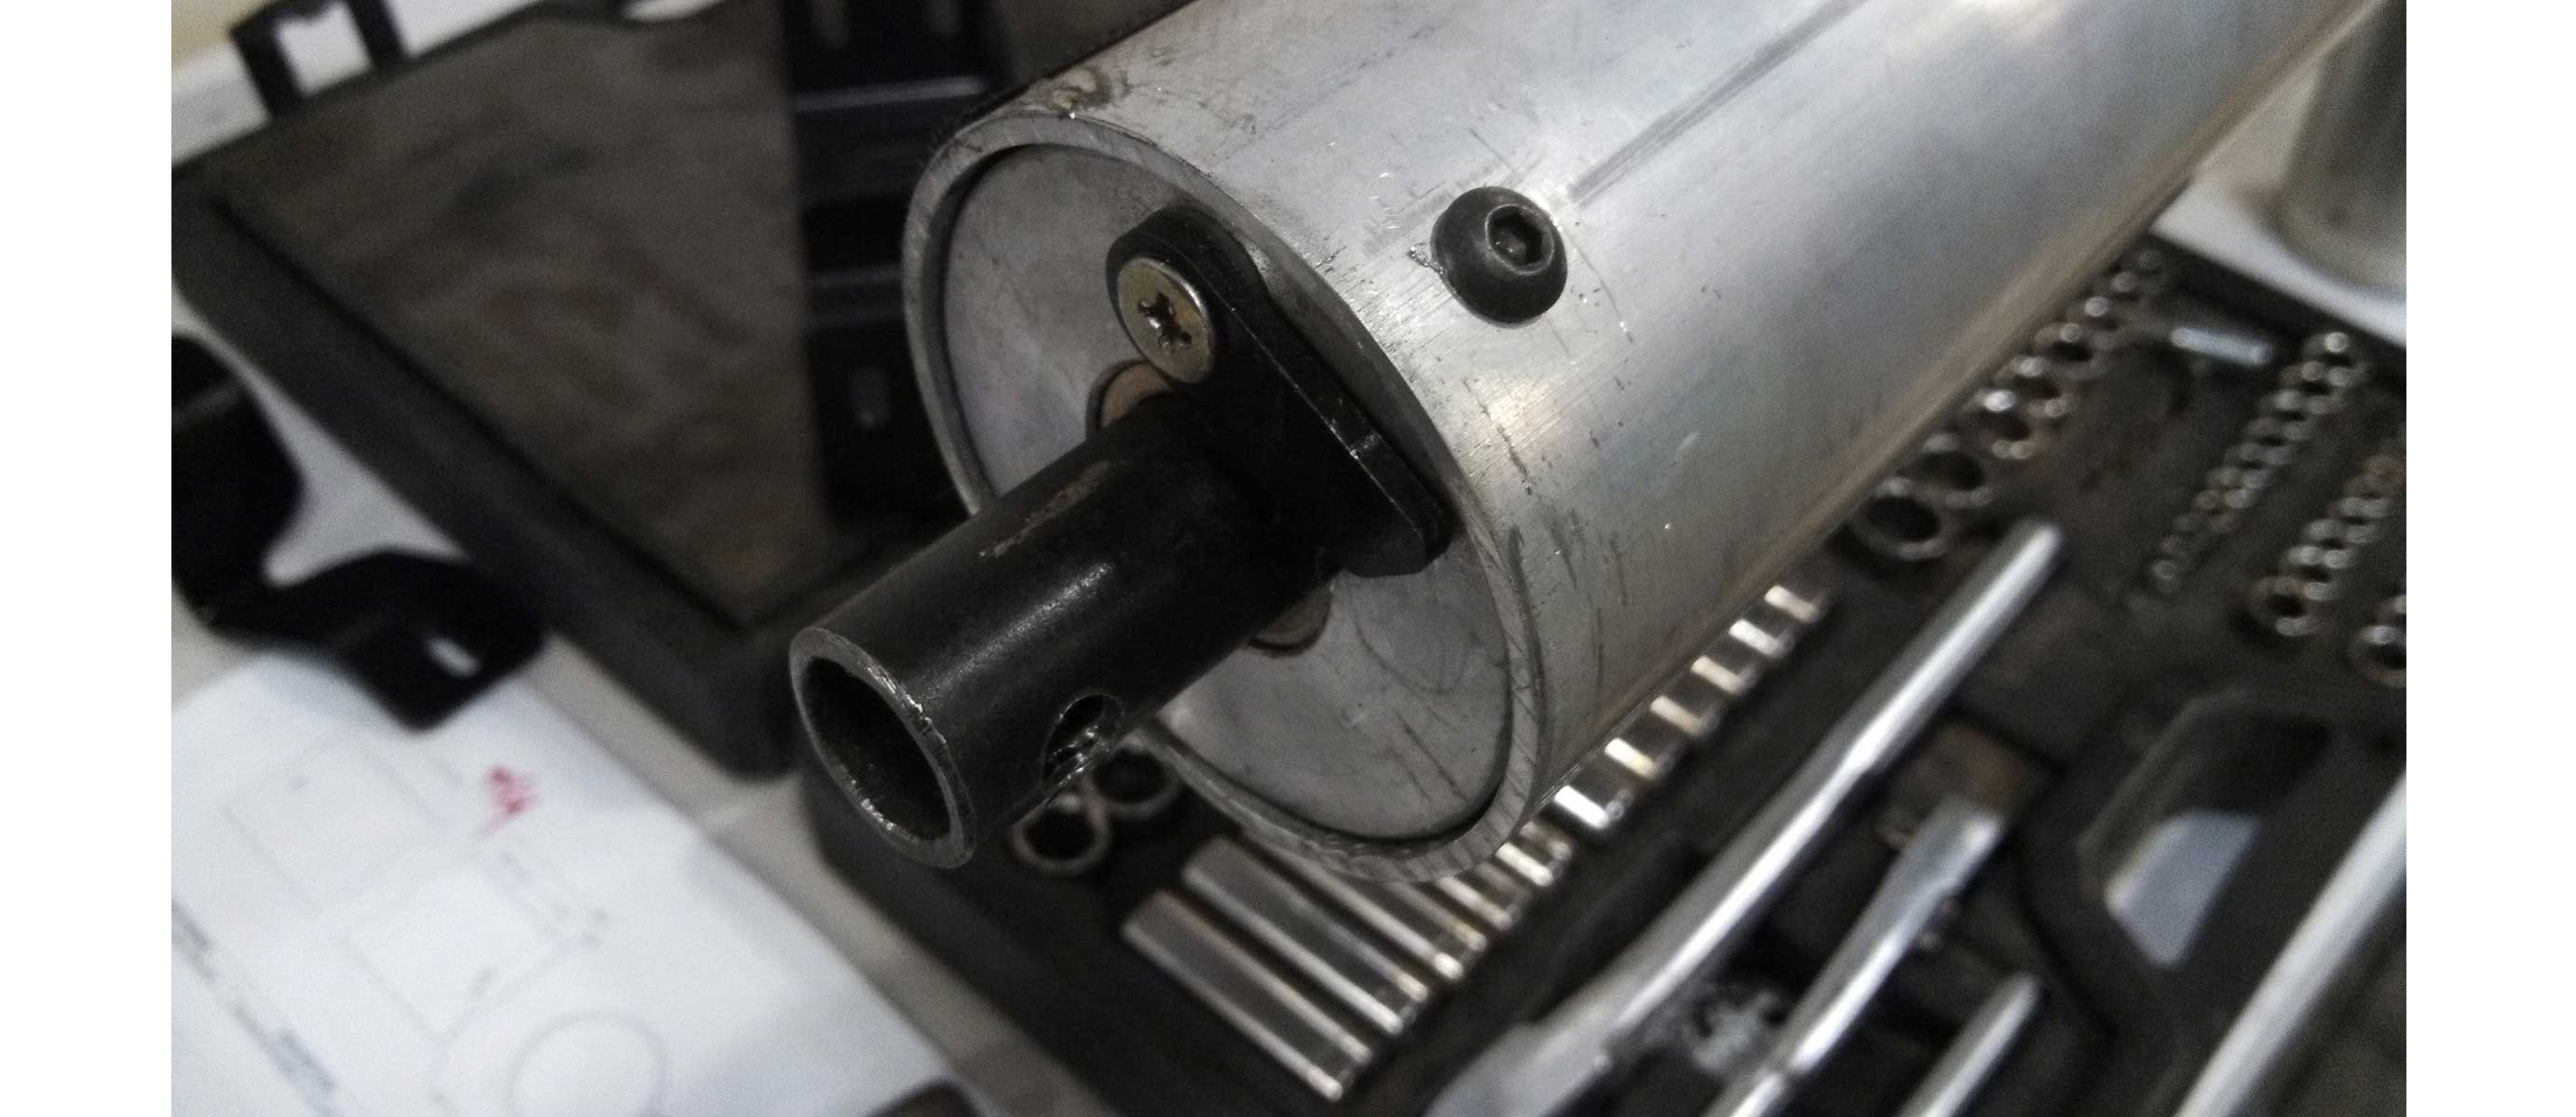 manufacturing tools close up